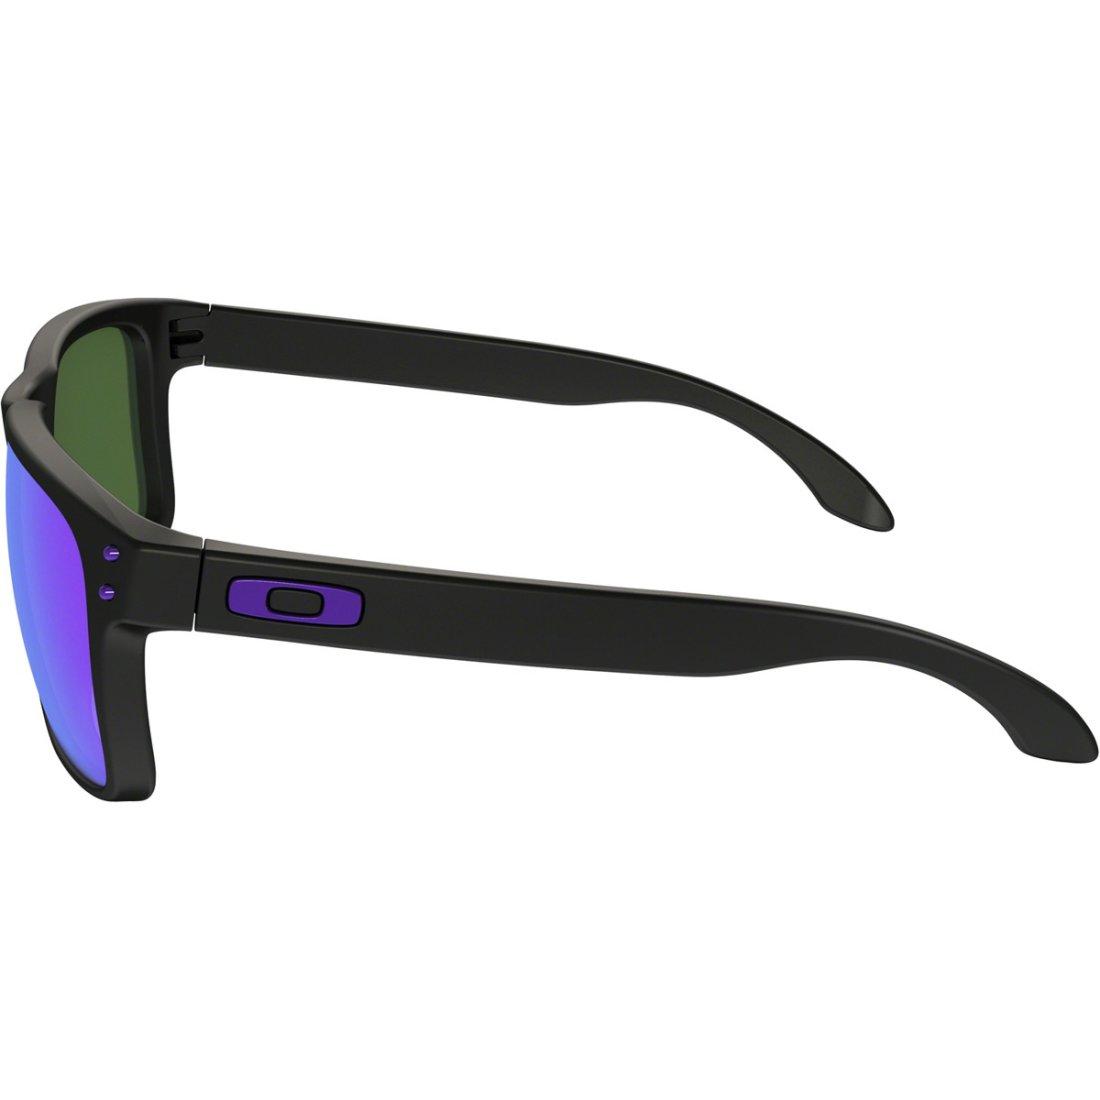 60475cb1f24 OAKLEY Holbrook Julian Wilson Signature Series Matte Black   Violet Iridium  Sun glasses